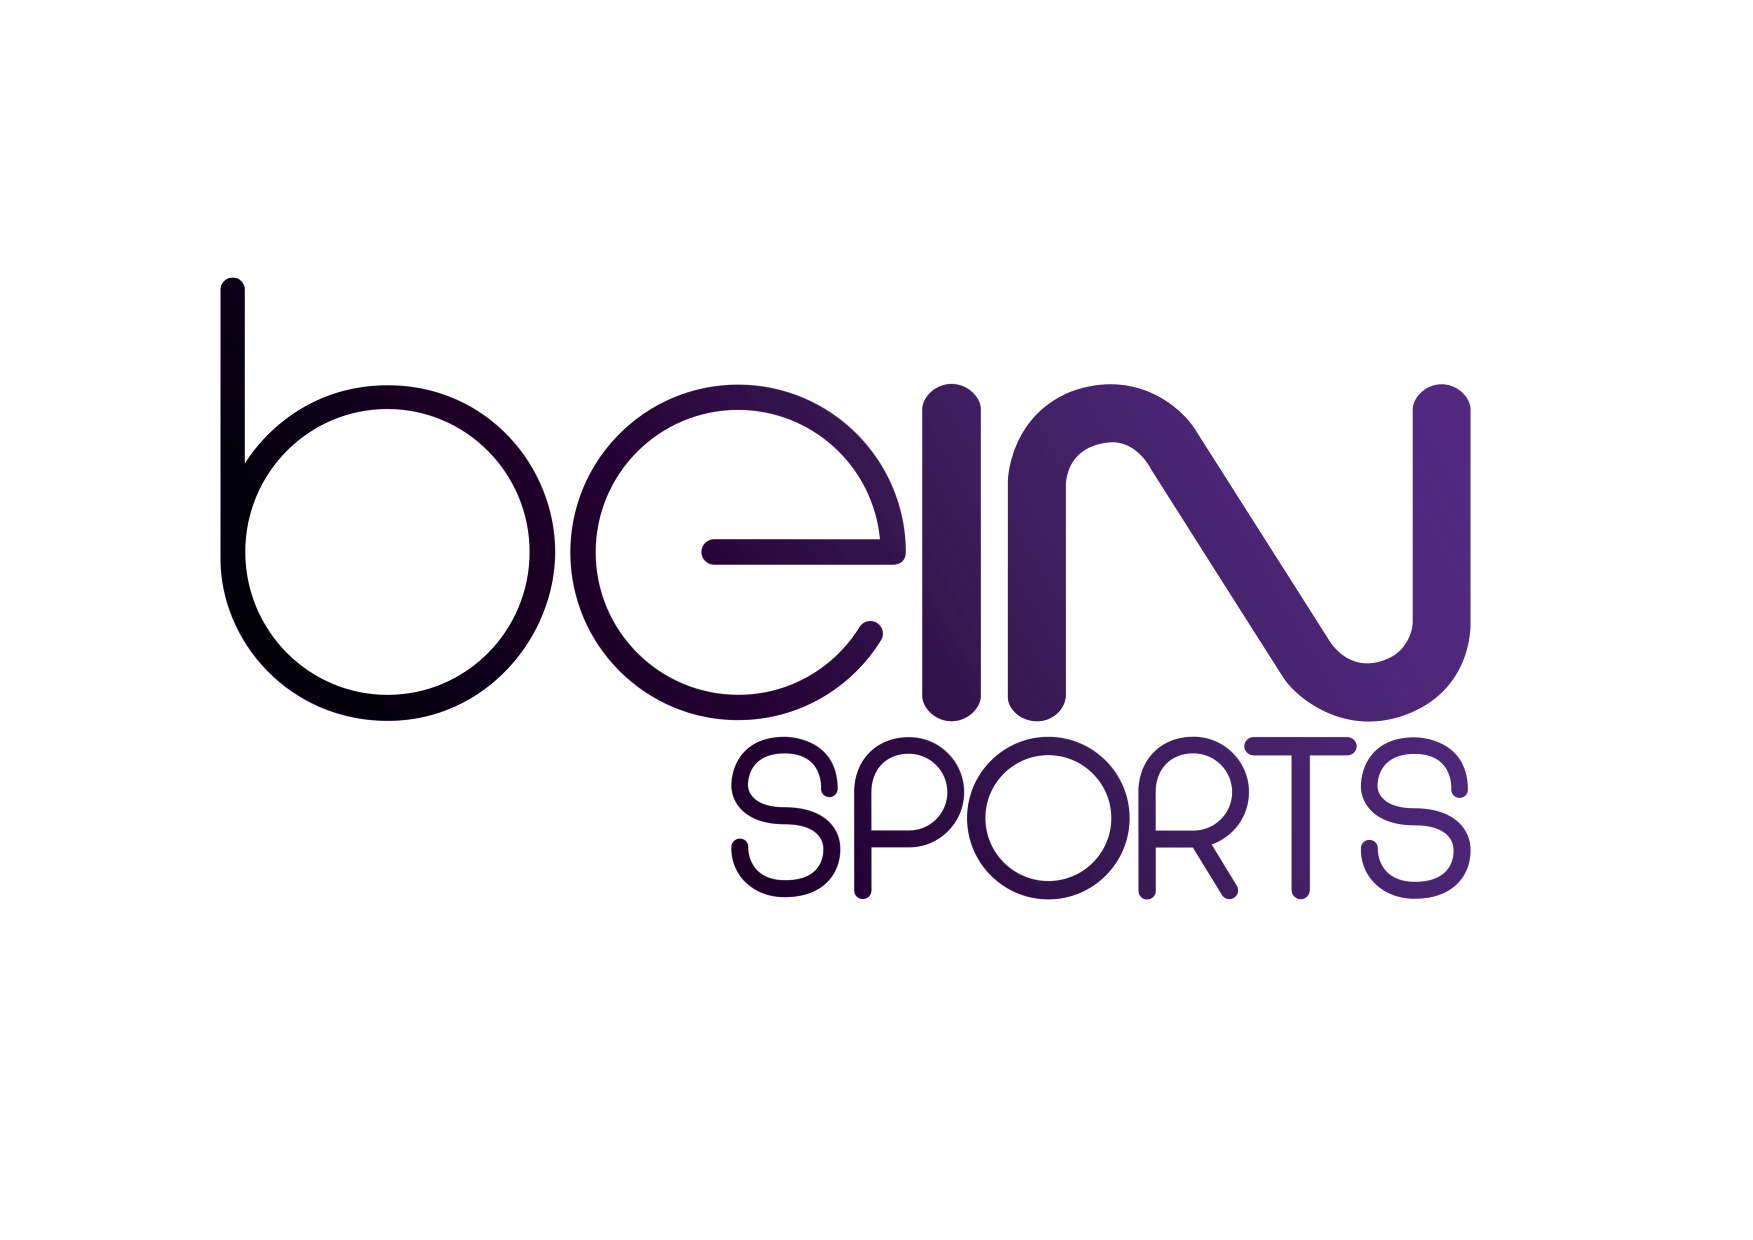 Ldc Droits Tv Bein Sports Reagit Http Www Europafoot Com Ldc Droits Tv Bein Sports Reagit Bein Sports Logos Vector Logo